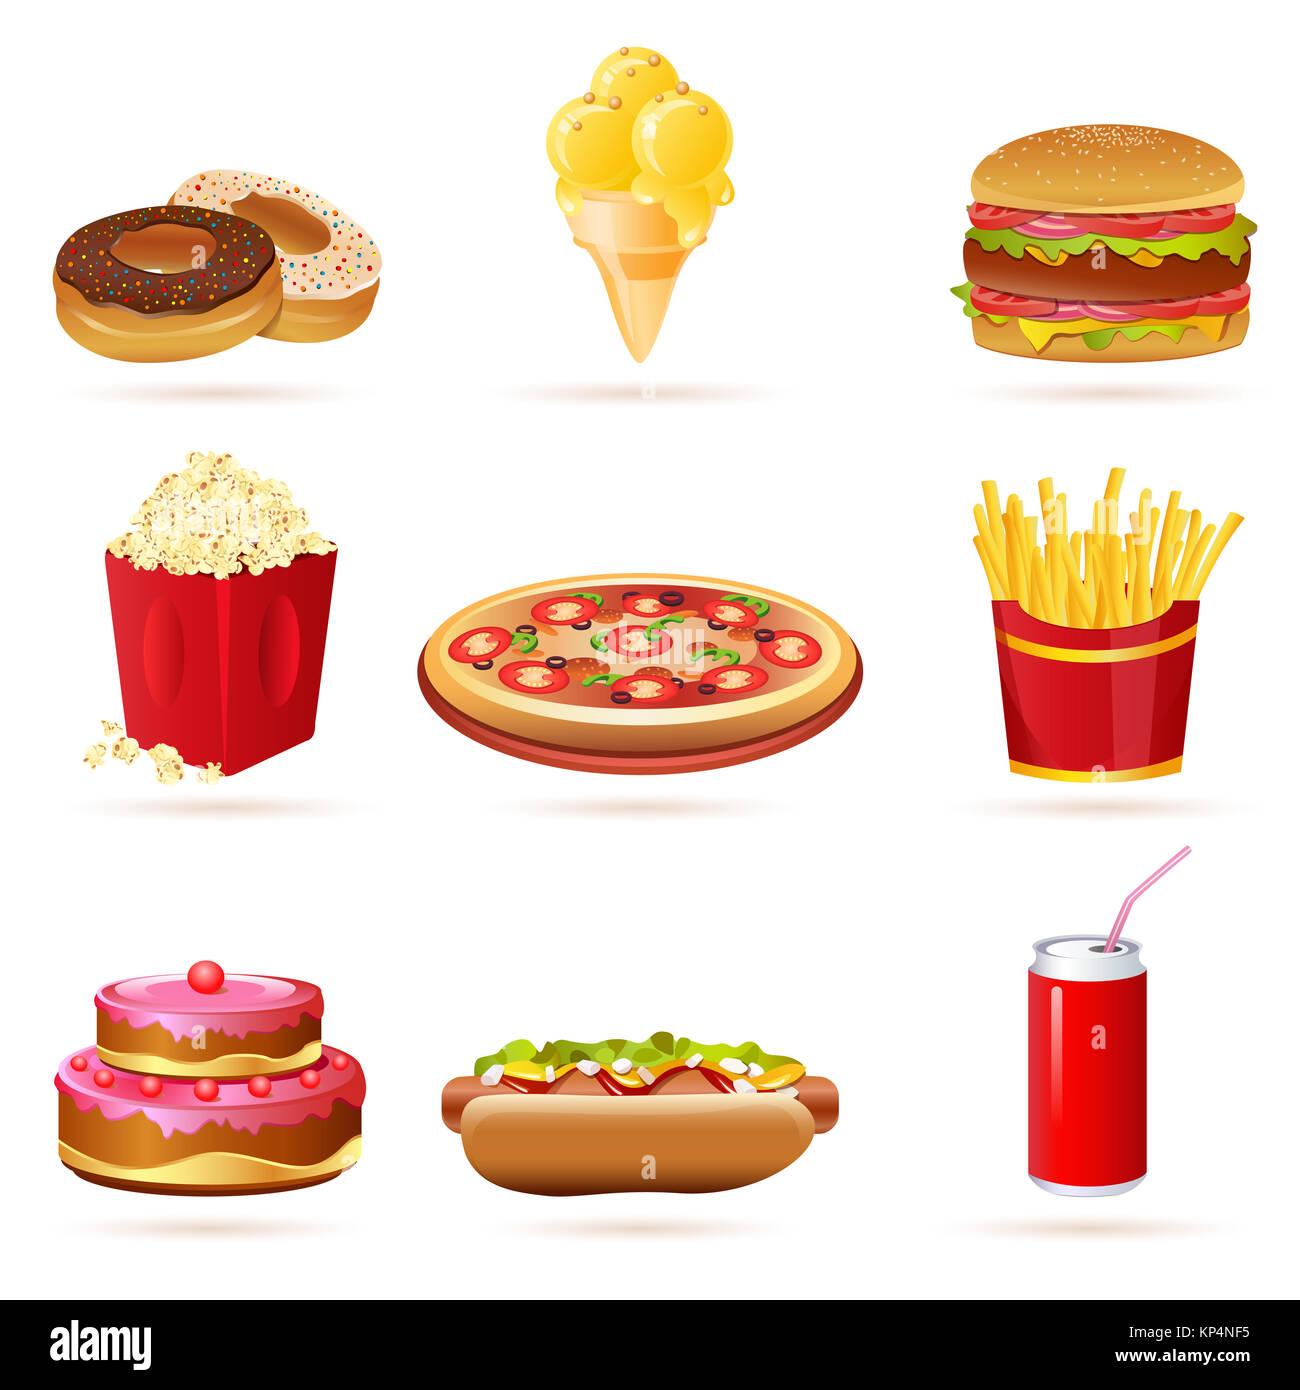 illustration of junk food icons on white background - Stock Image